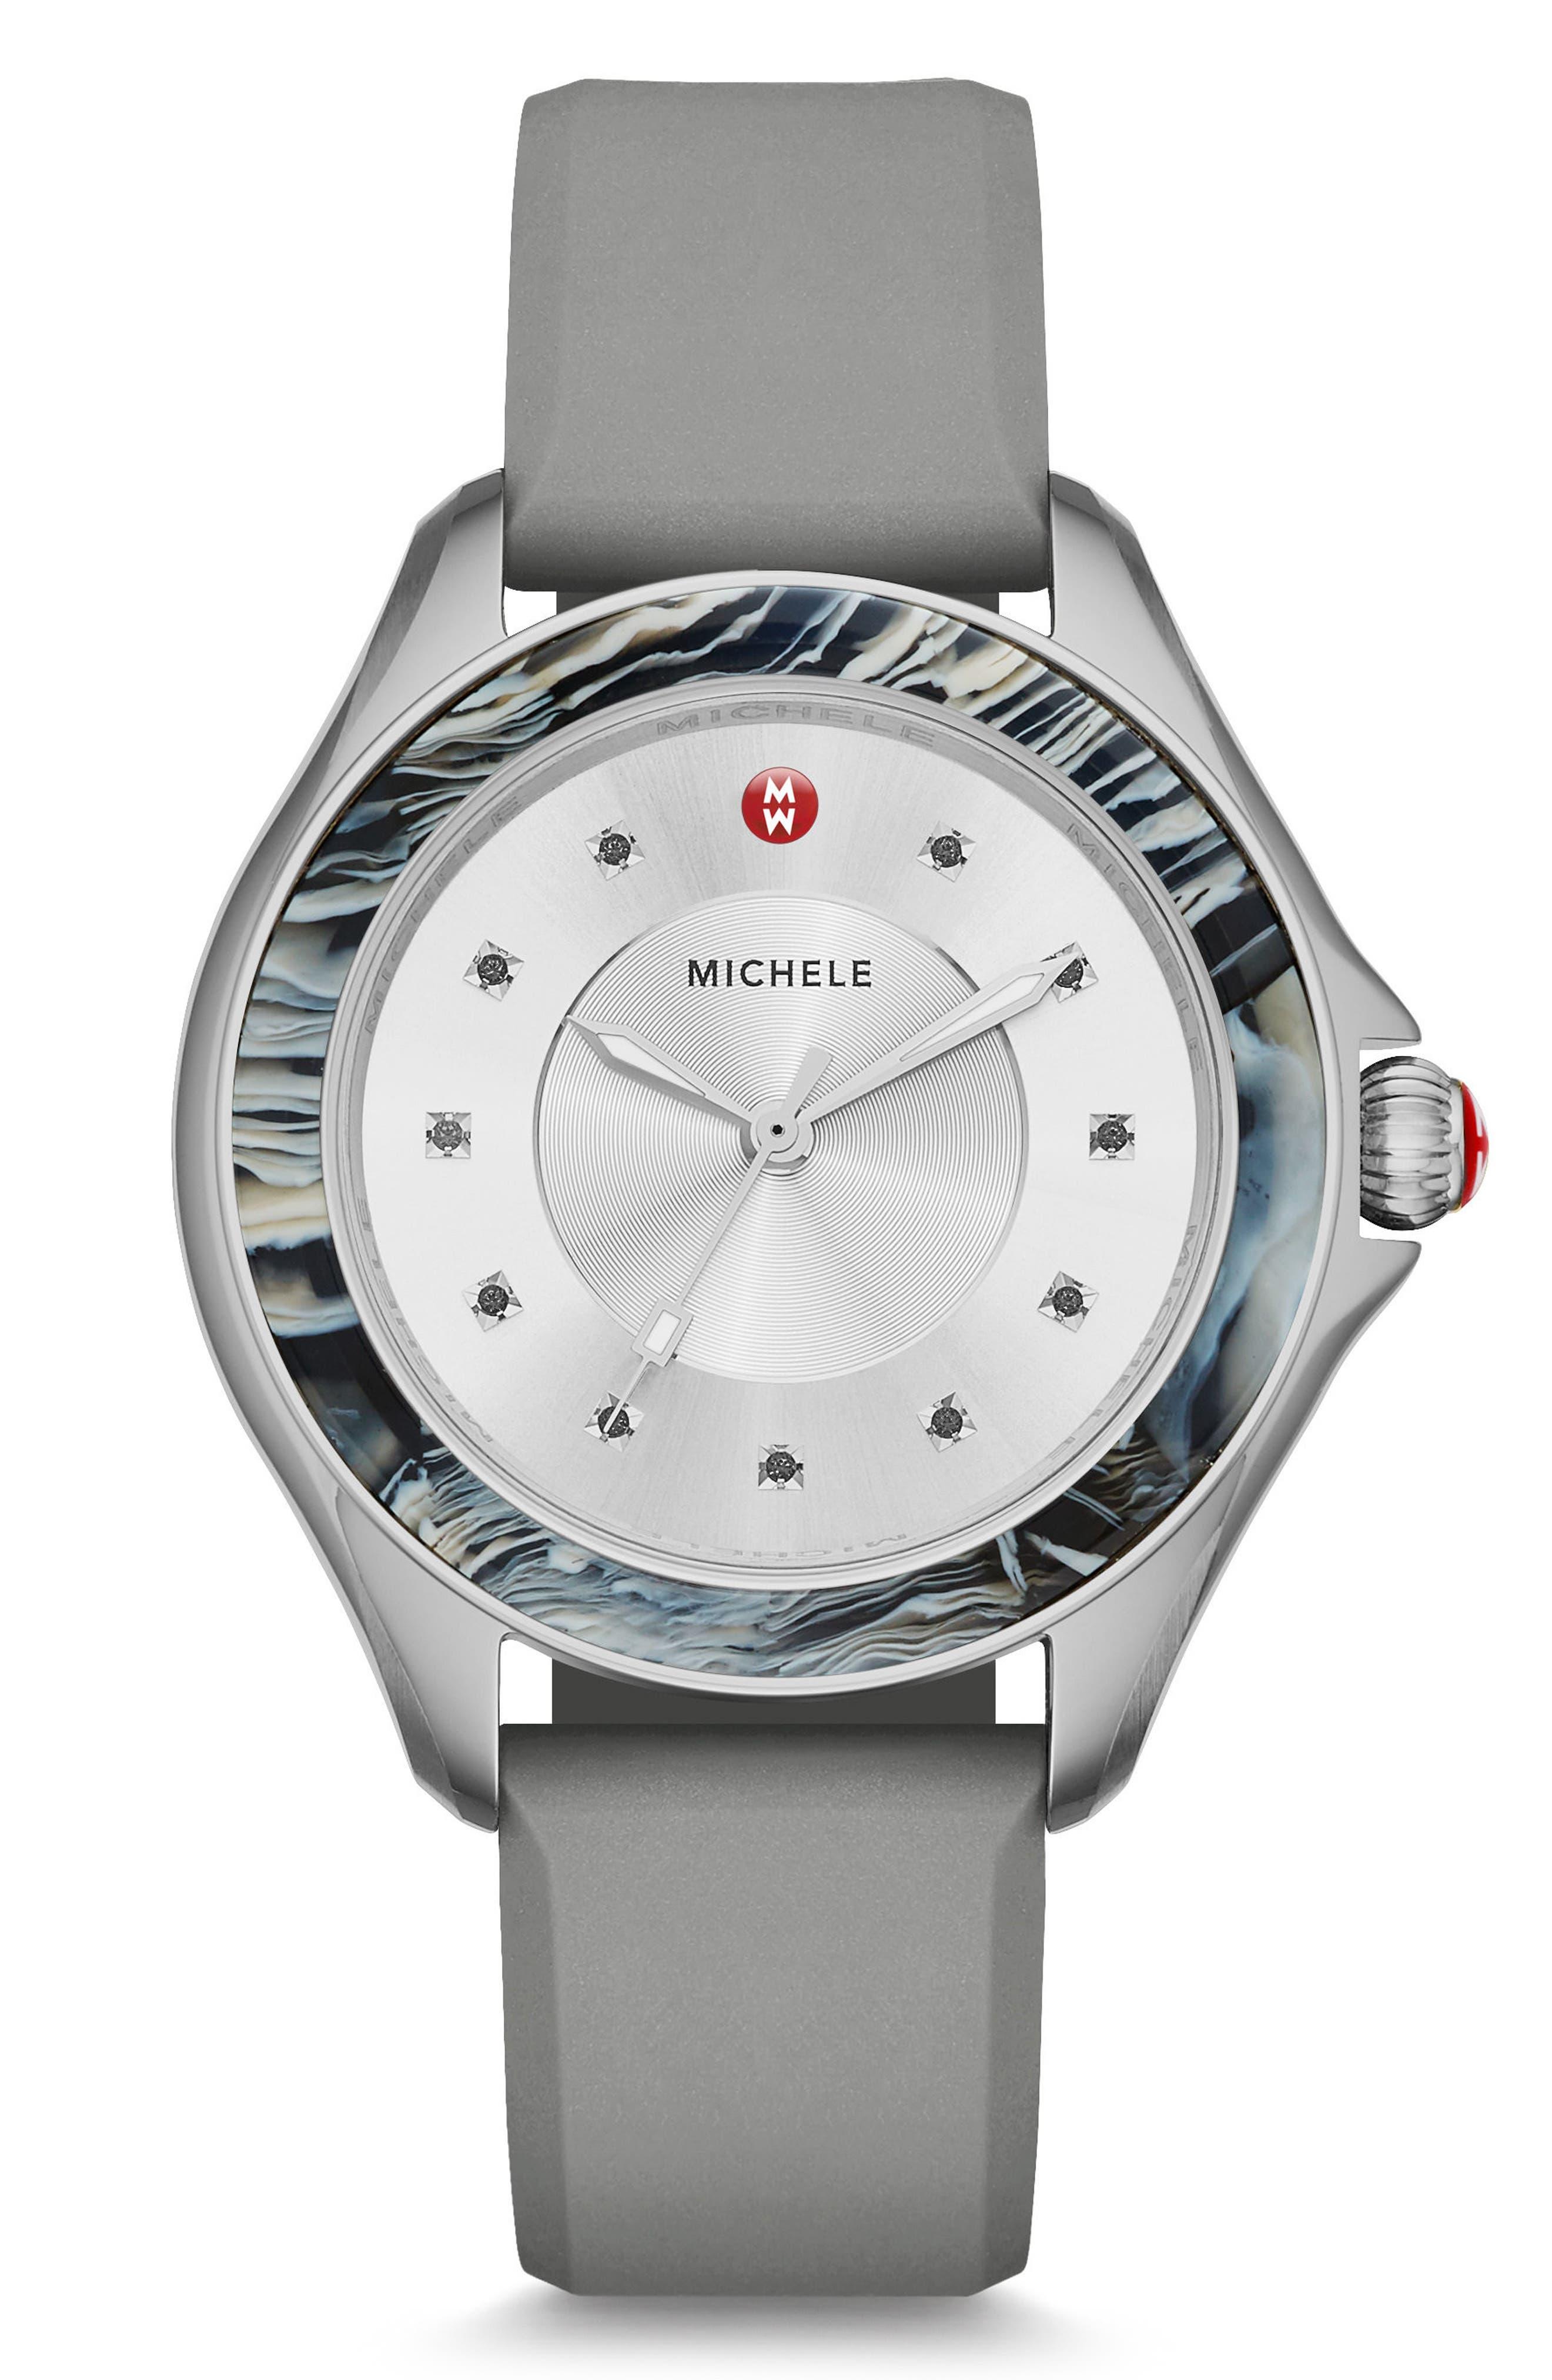 MICHELE Cape Jewel Head & Silicone Strap Watch, 40mm